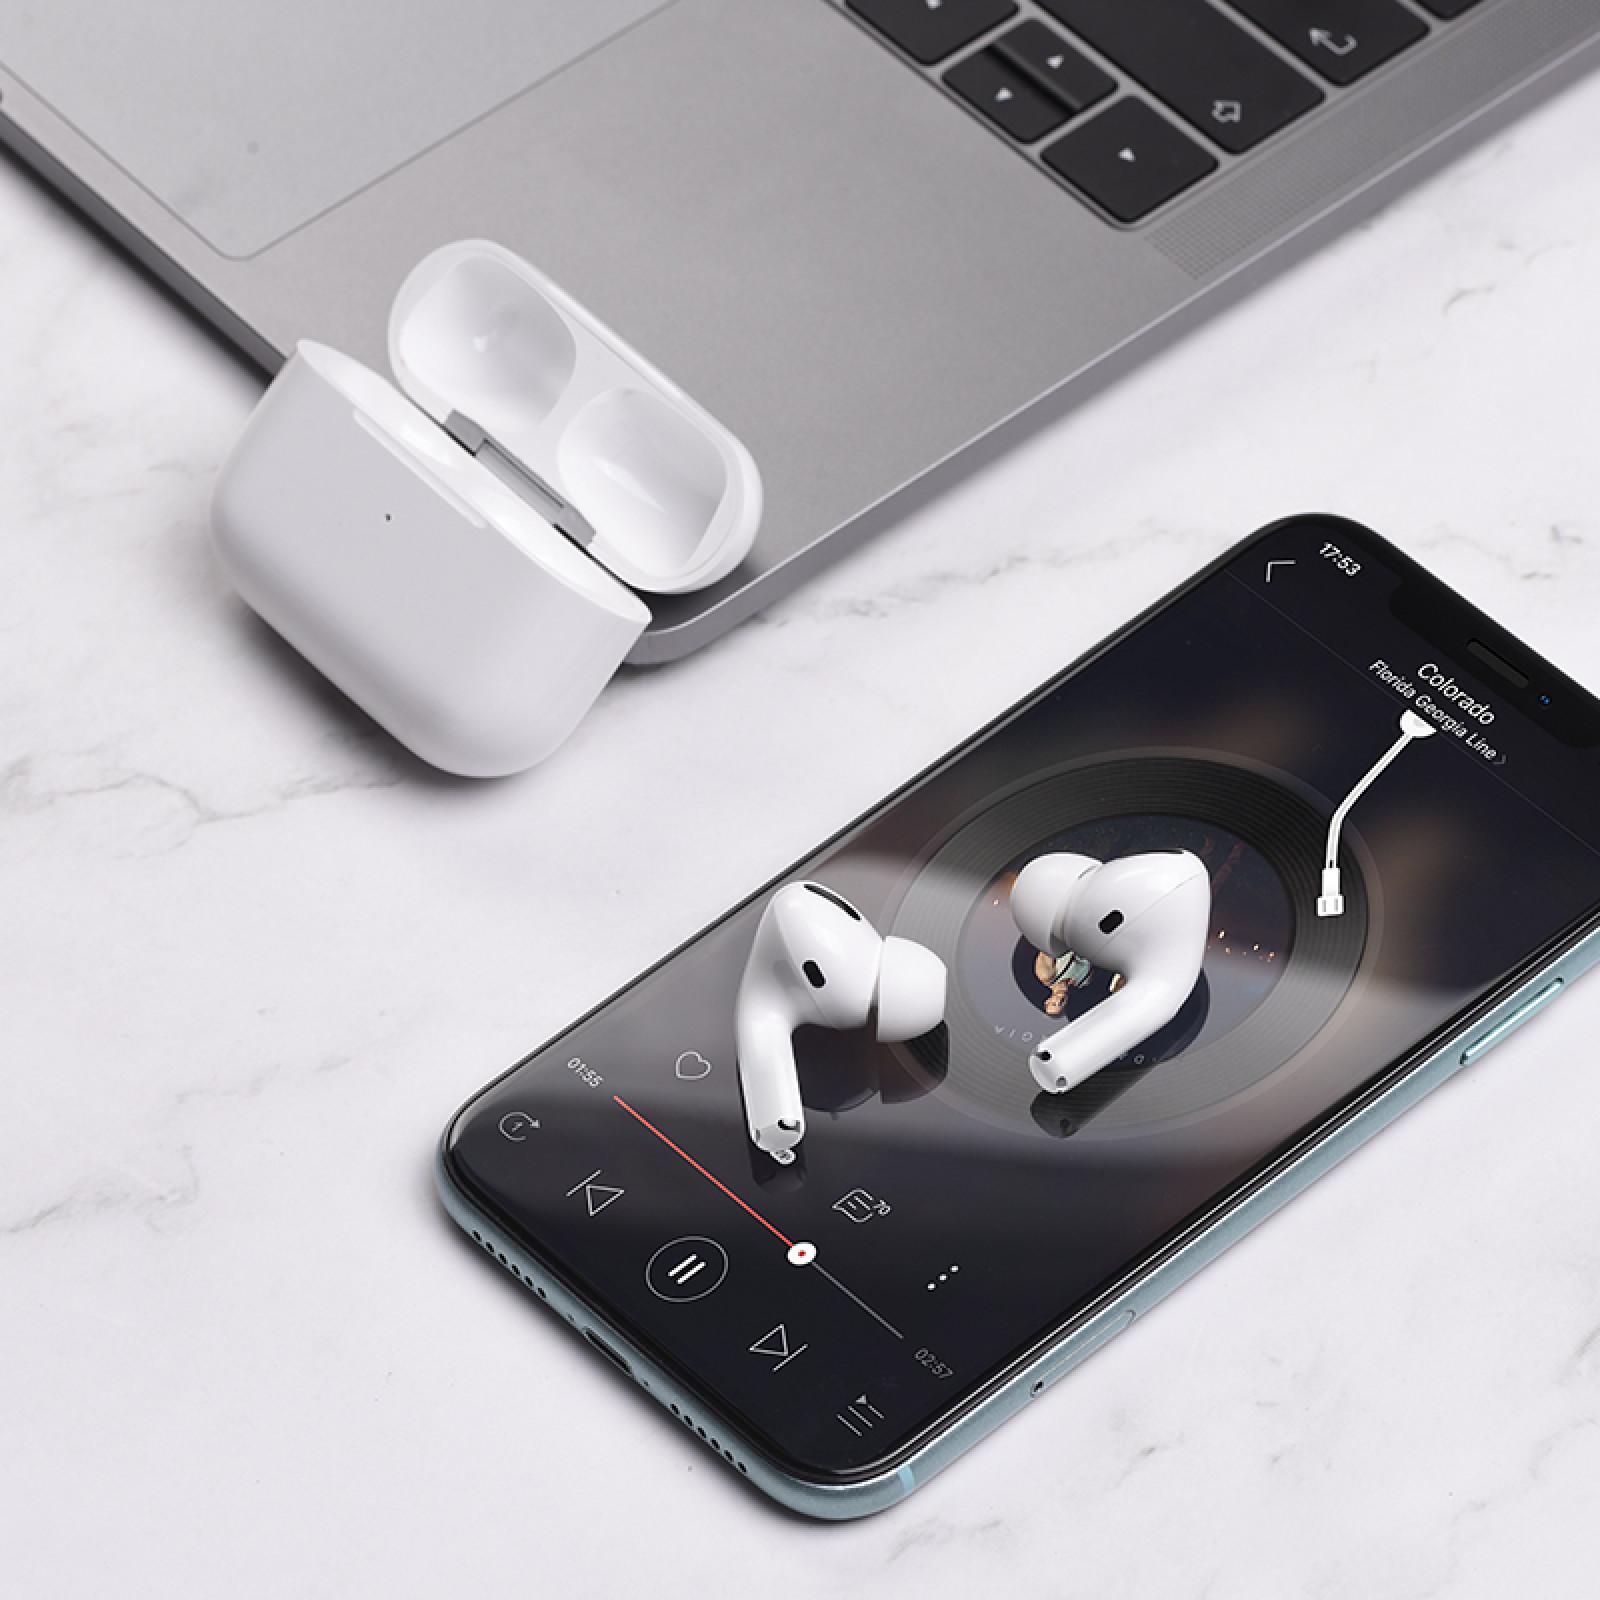 Bluetooth слушалки Hoco EW04 Original series true wireless BT headset - Бели